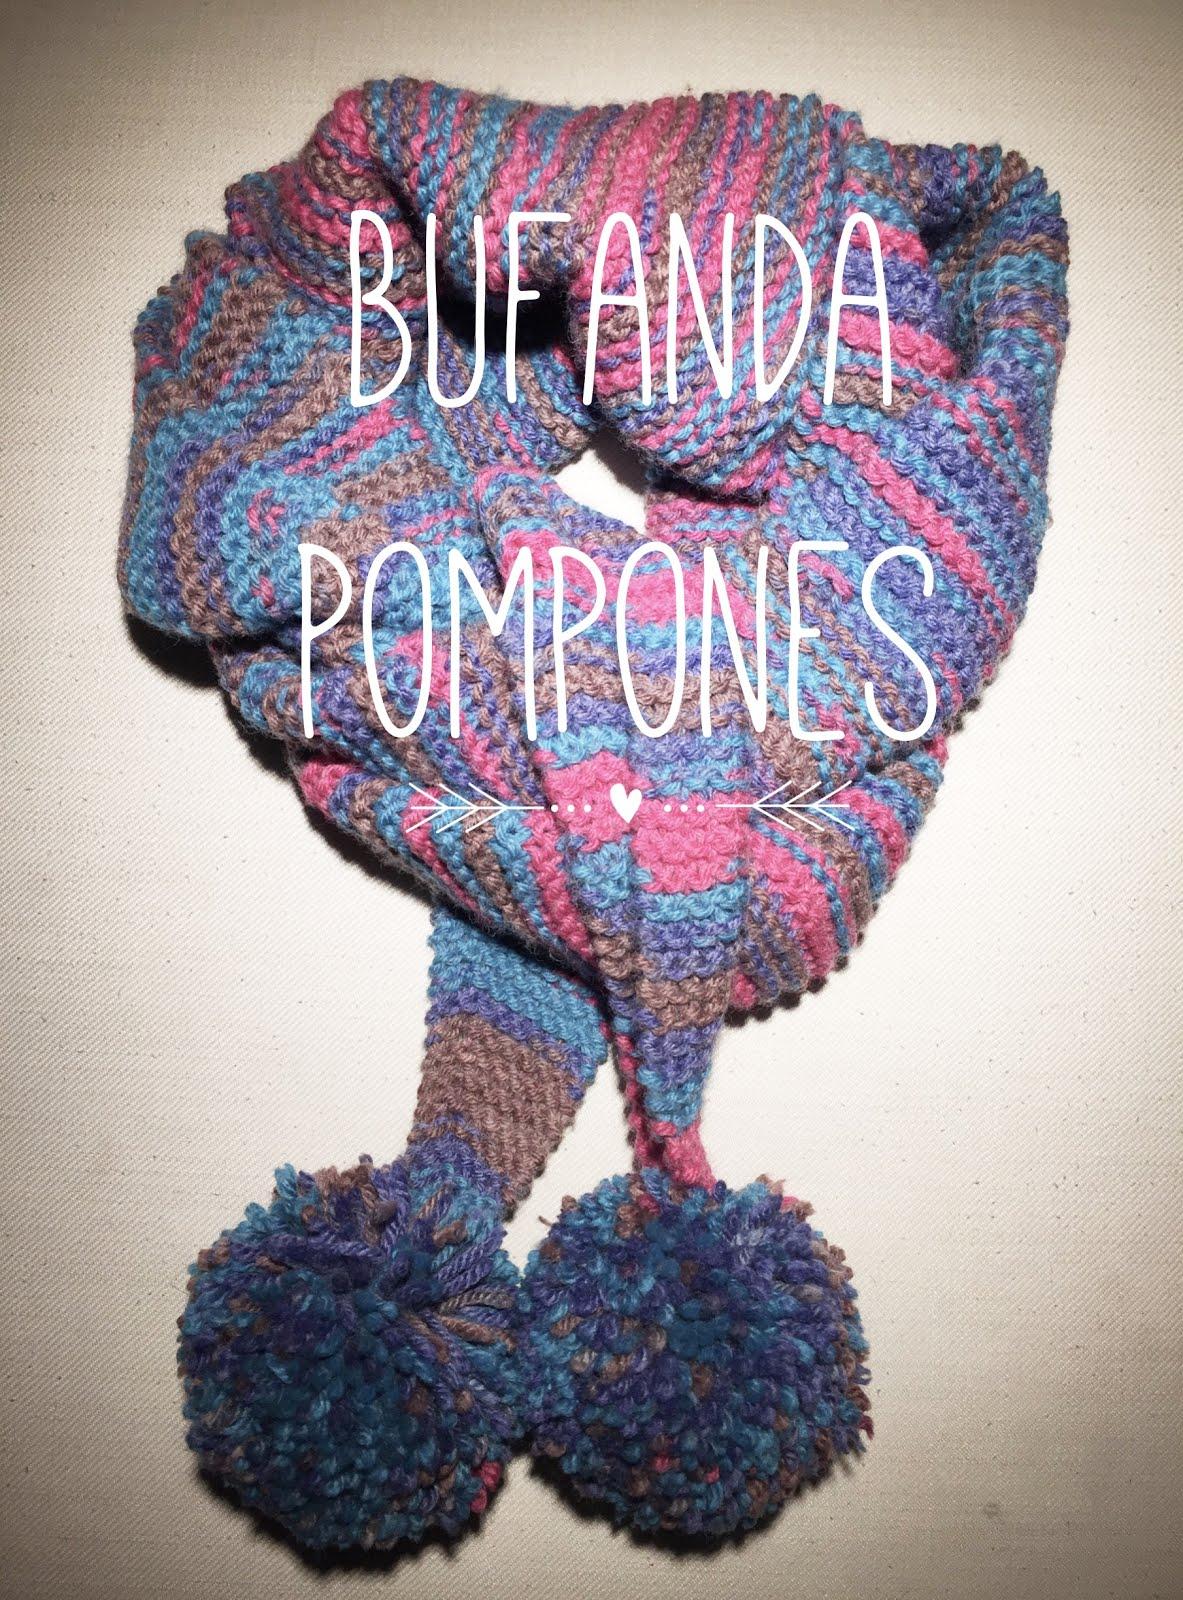 Kubaloo ...tu universo creativo ...: #24/2017 - Bufanda Pompones ...